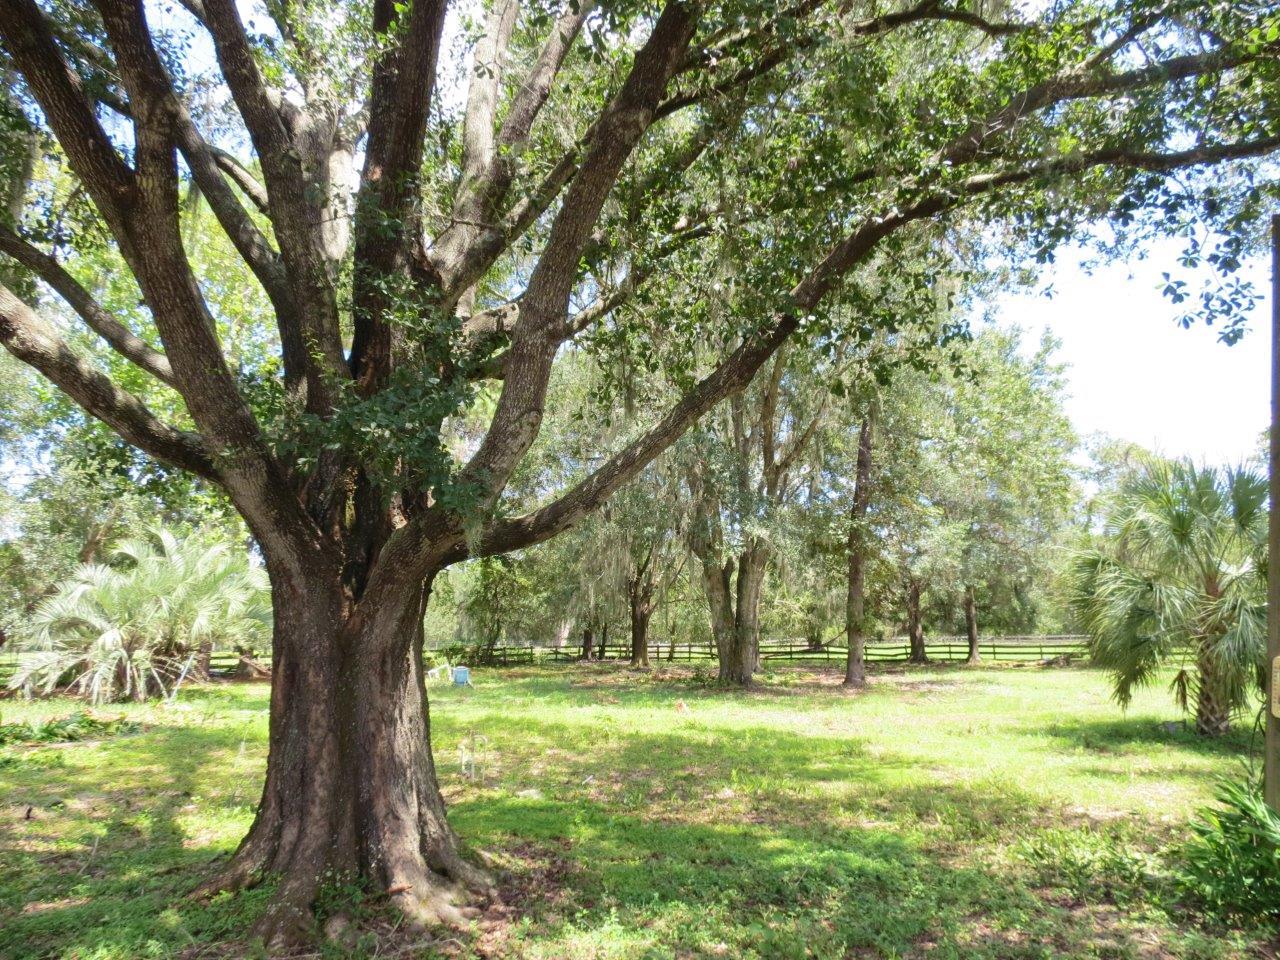 Hobson Simmons Road Homesite & Pasture 7.5 Acres in Lithia, FL